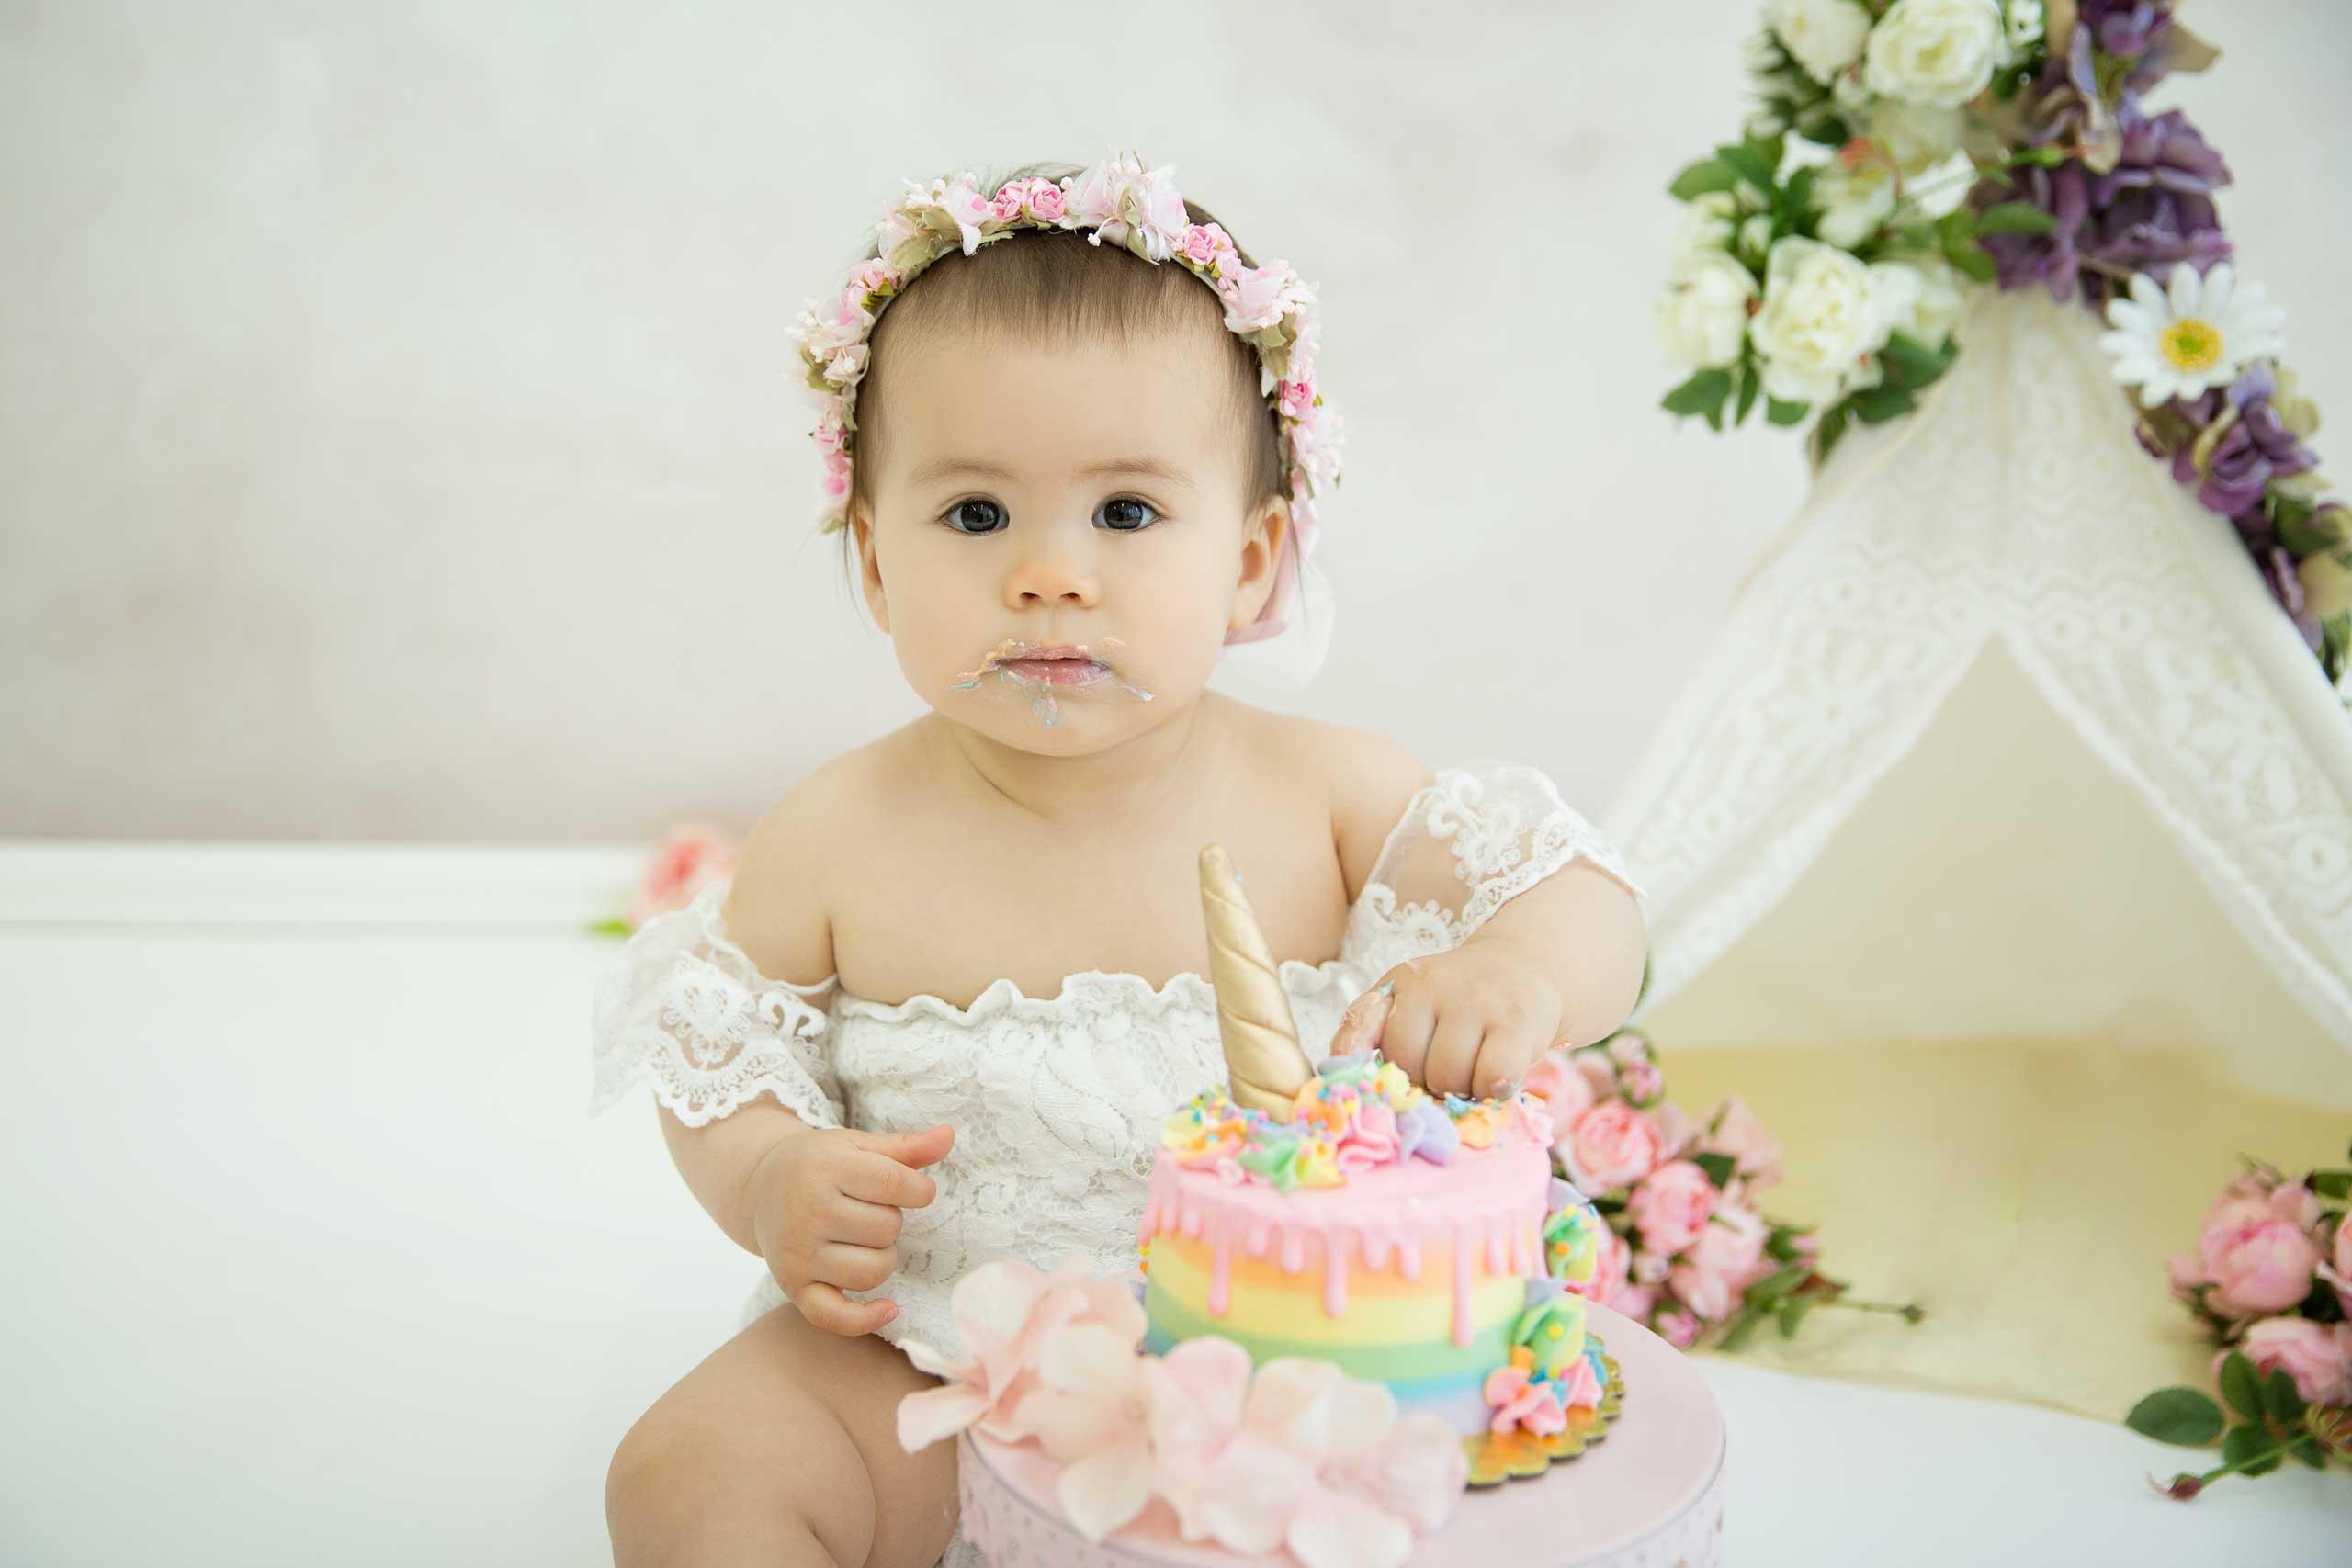 Cake Smash photography Los Angeles Ramina Magid